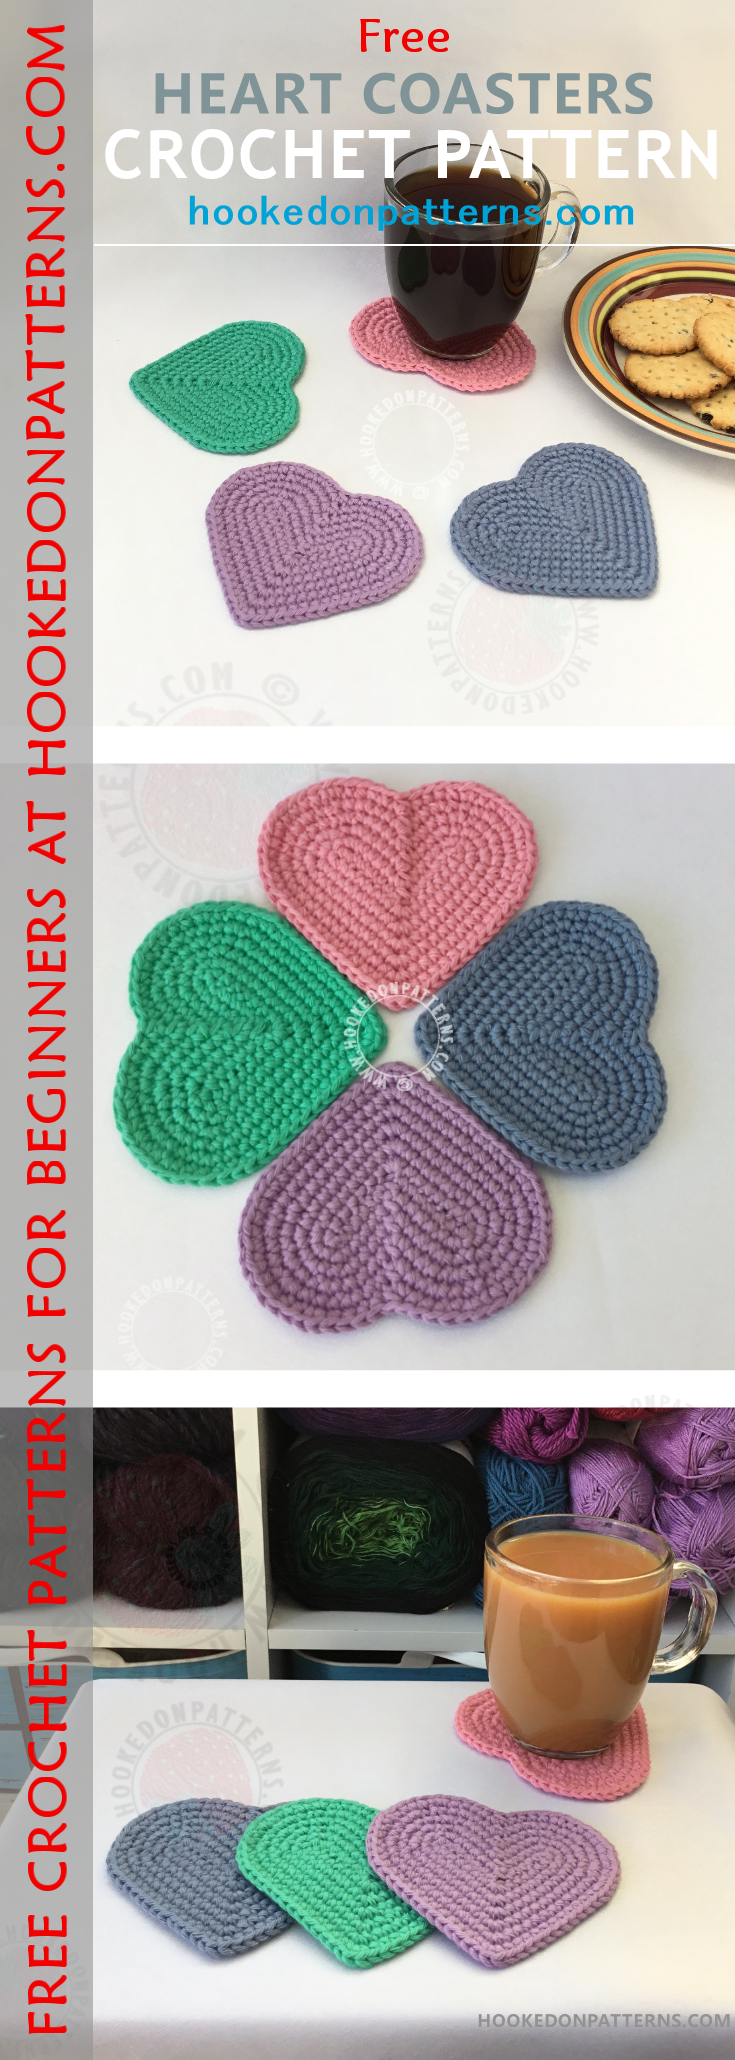 Free Heart Coaster Crochet Pattern   Tejido, Ganchillo y Tejidos con ...